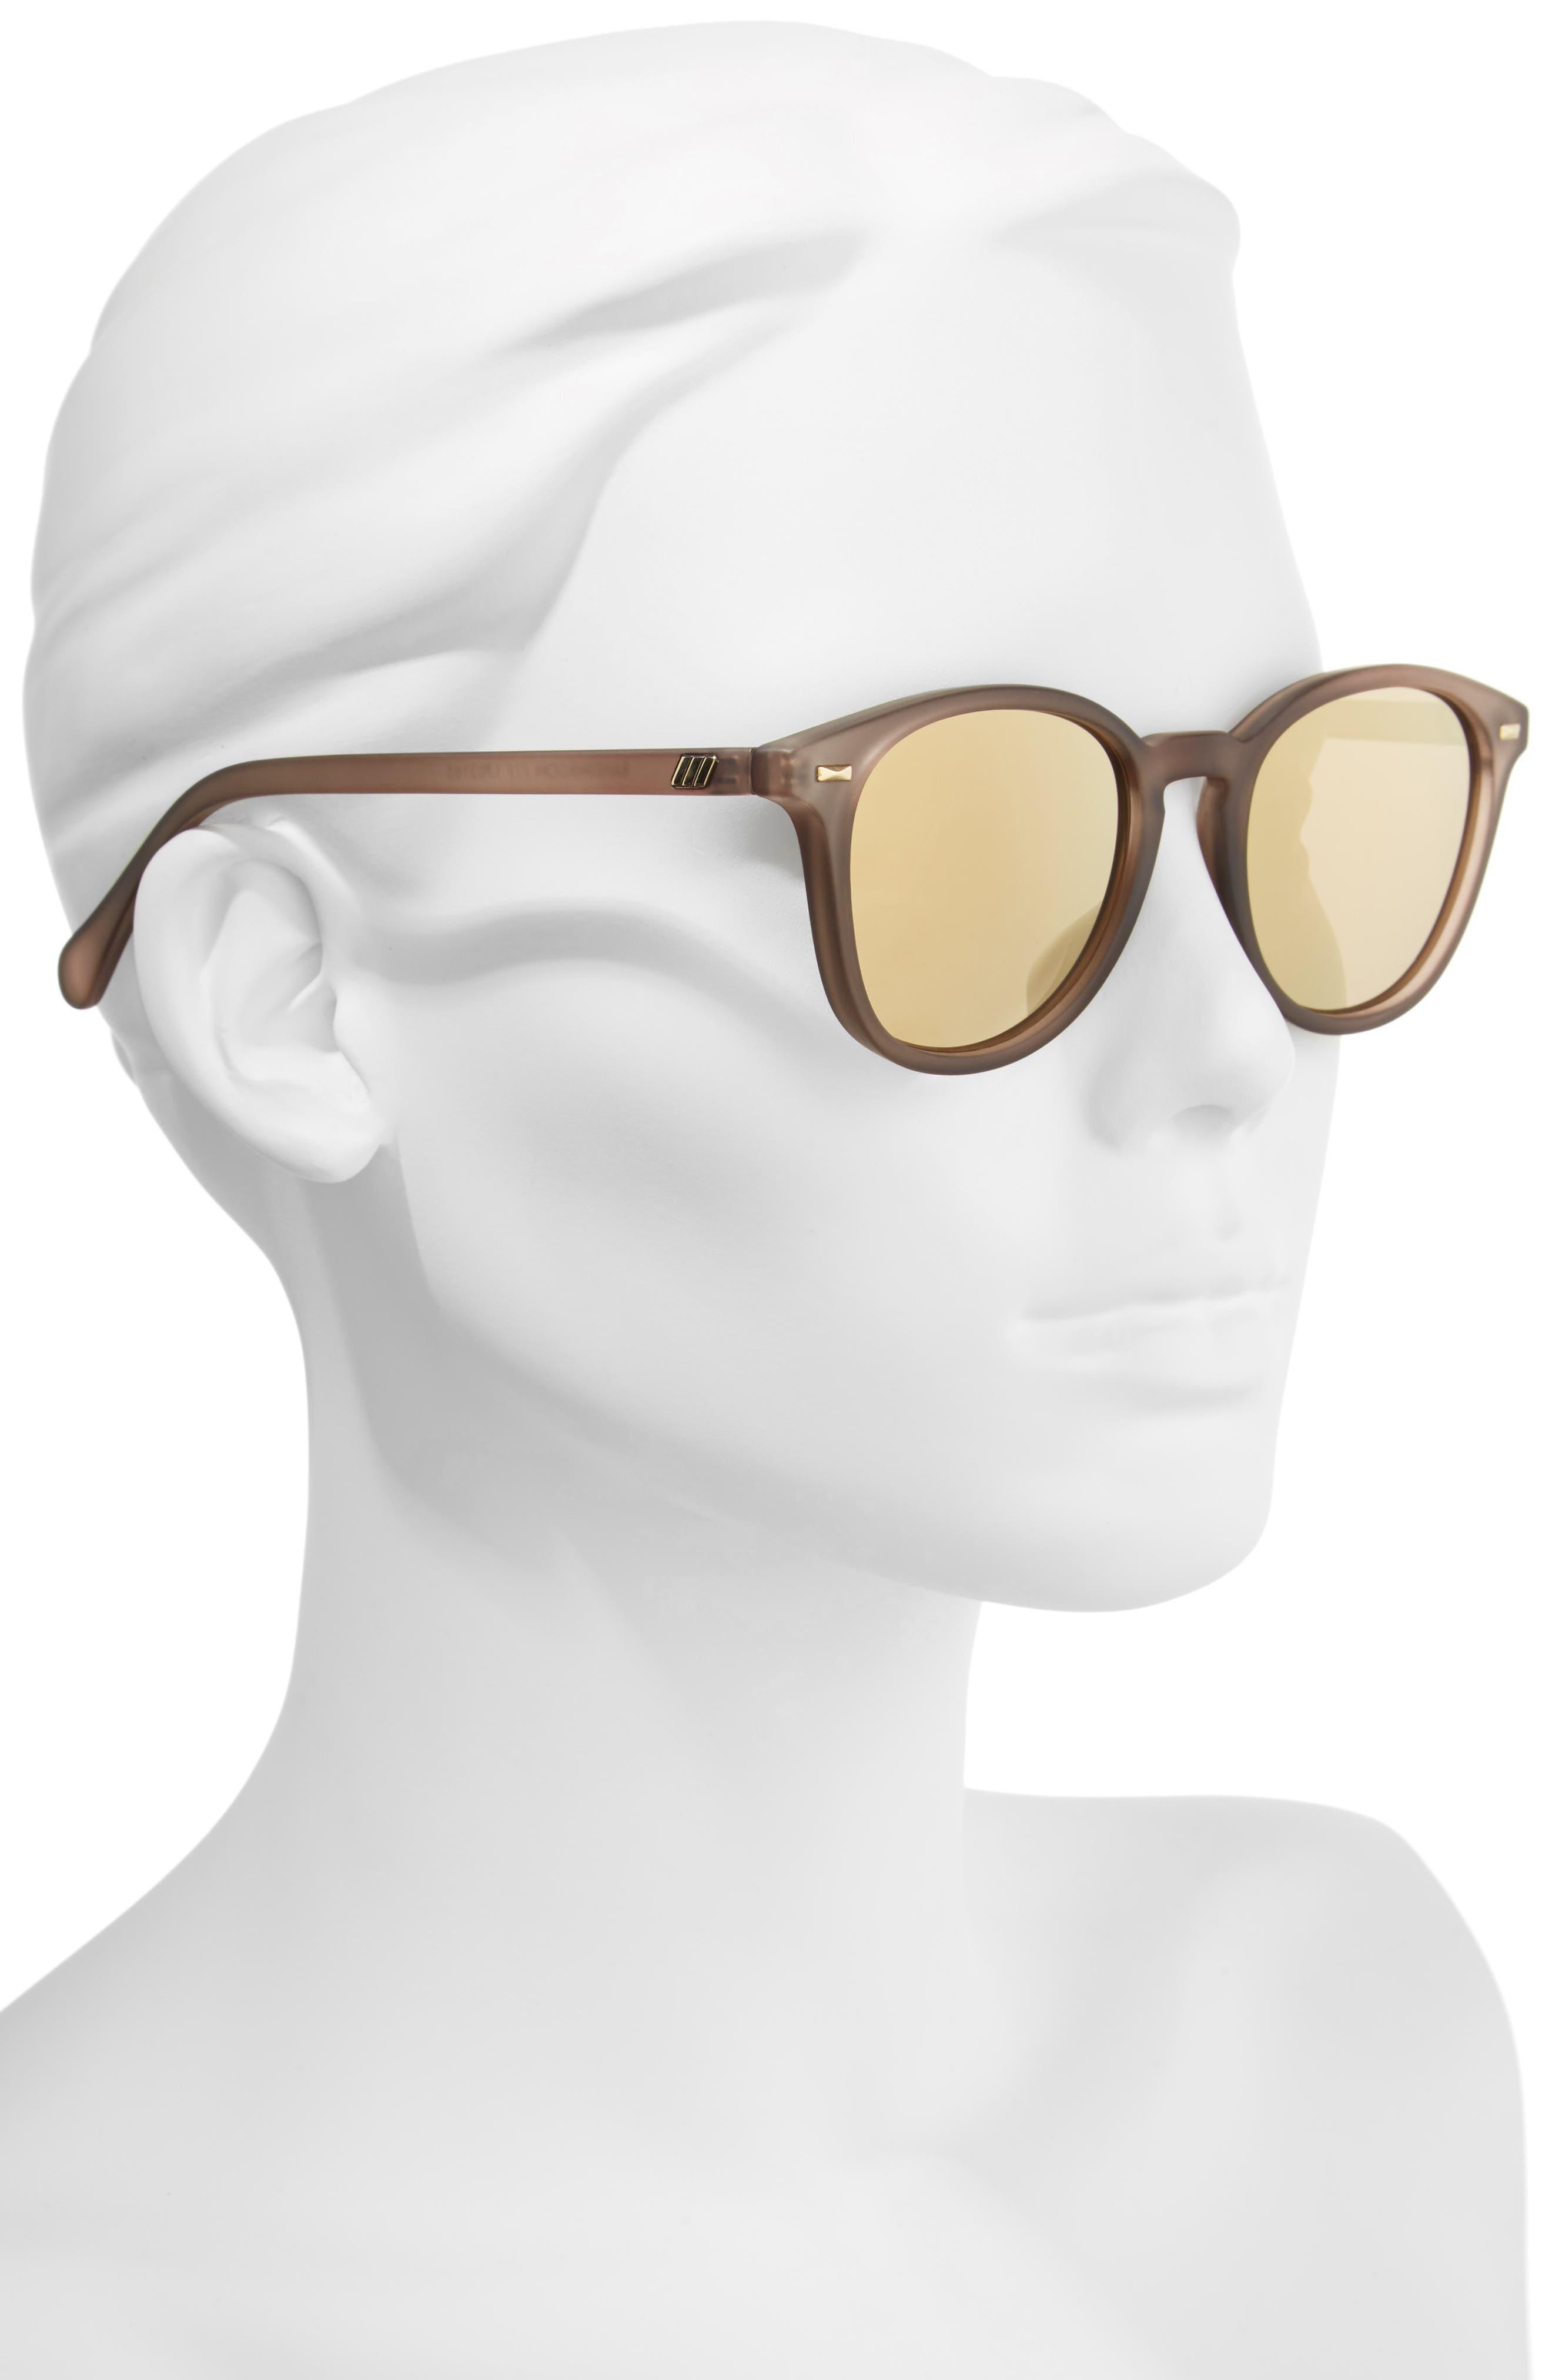 x Lumira Bandwagon 51mm Sunglasses & Candle Gift Set,                             Alternate thumbnail 2, color,                             020